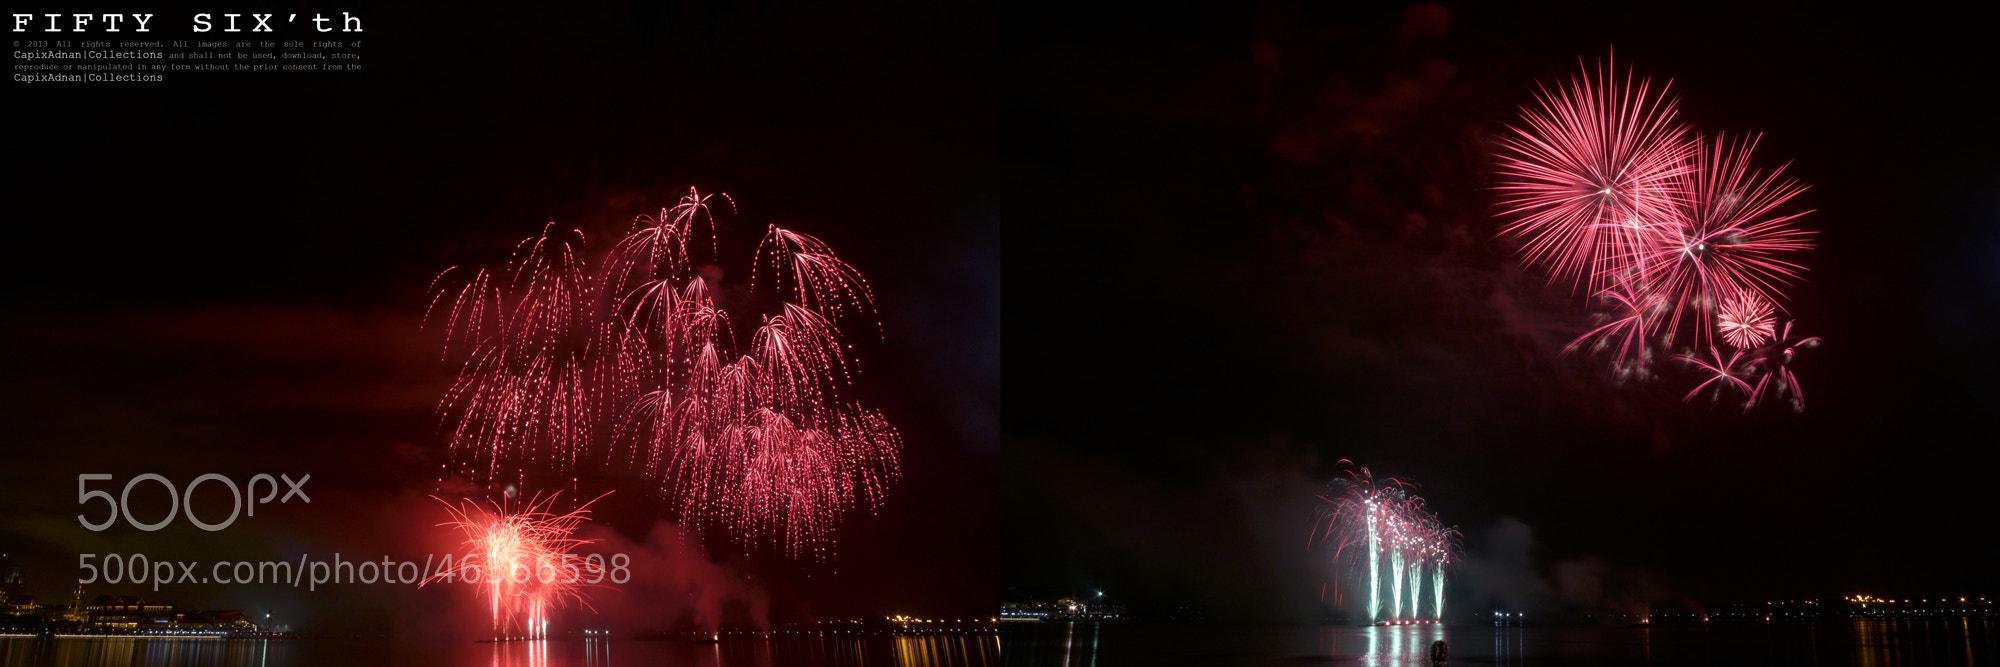 Photograph Putrajaya Firework Competition 2013 by Syafiq Adnan on 500px